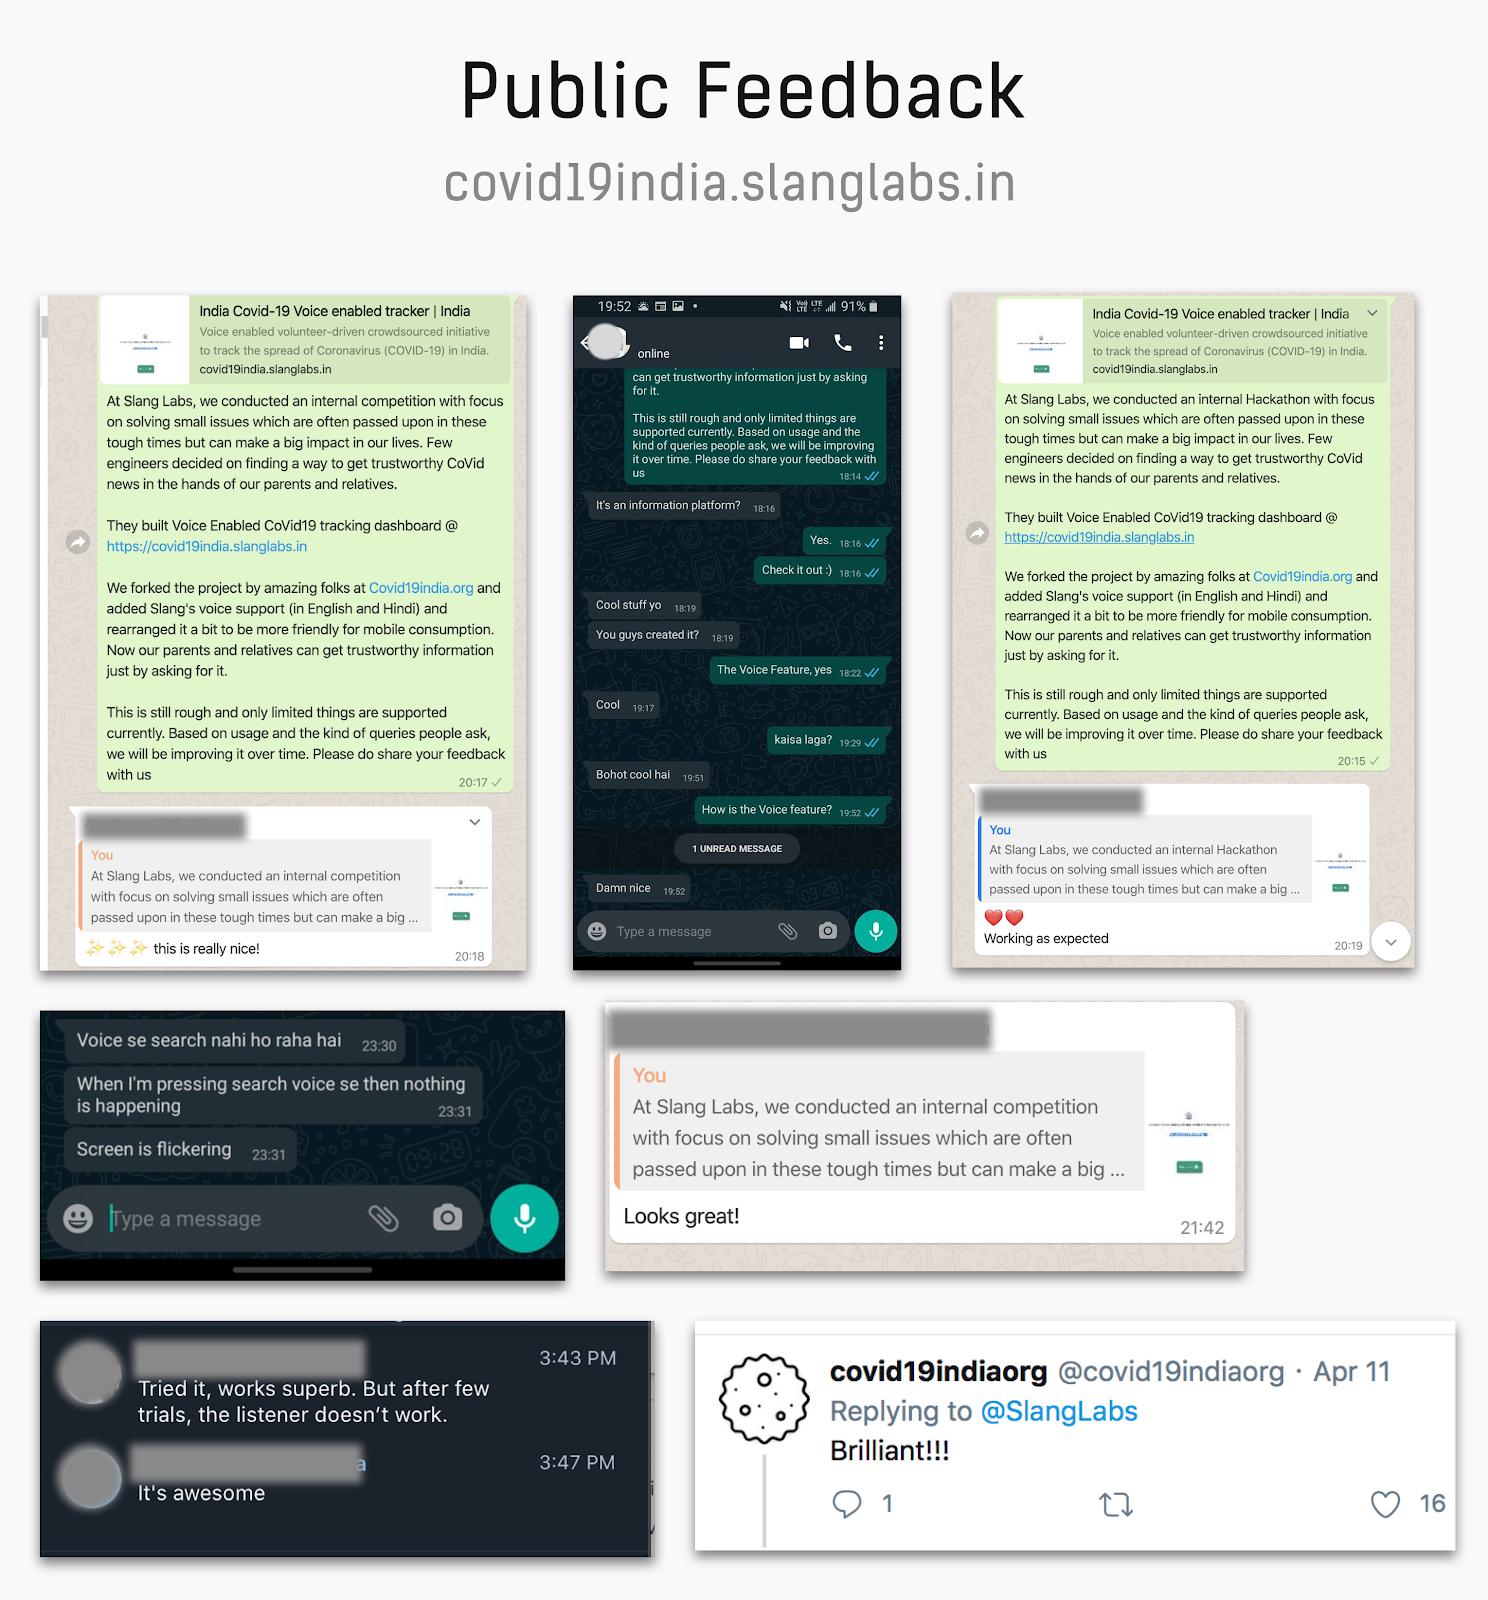 Public feedback on covid19india.slanglabs.in